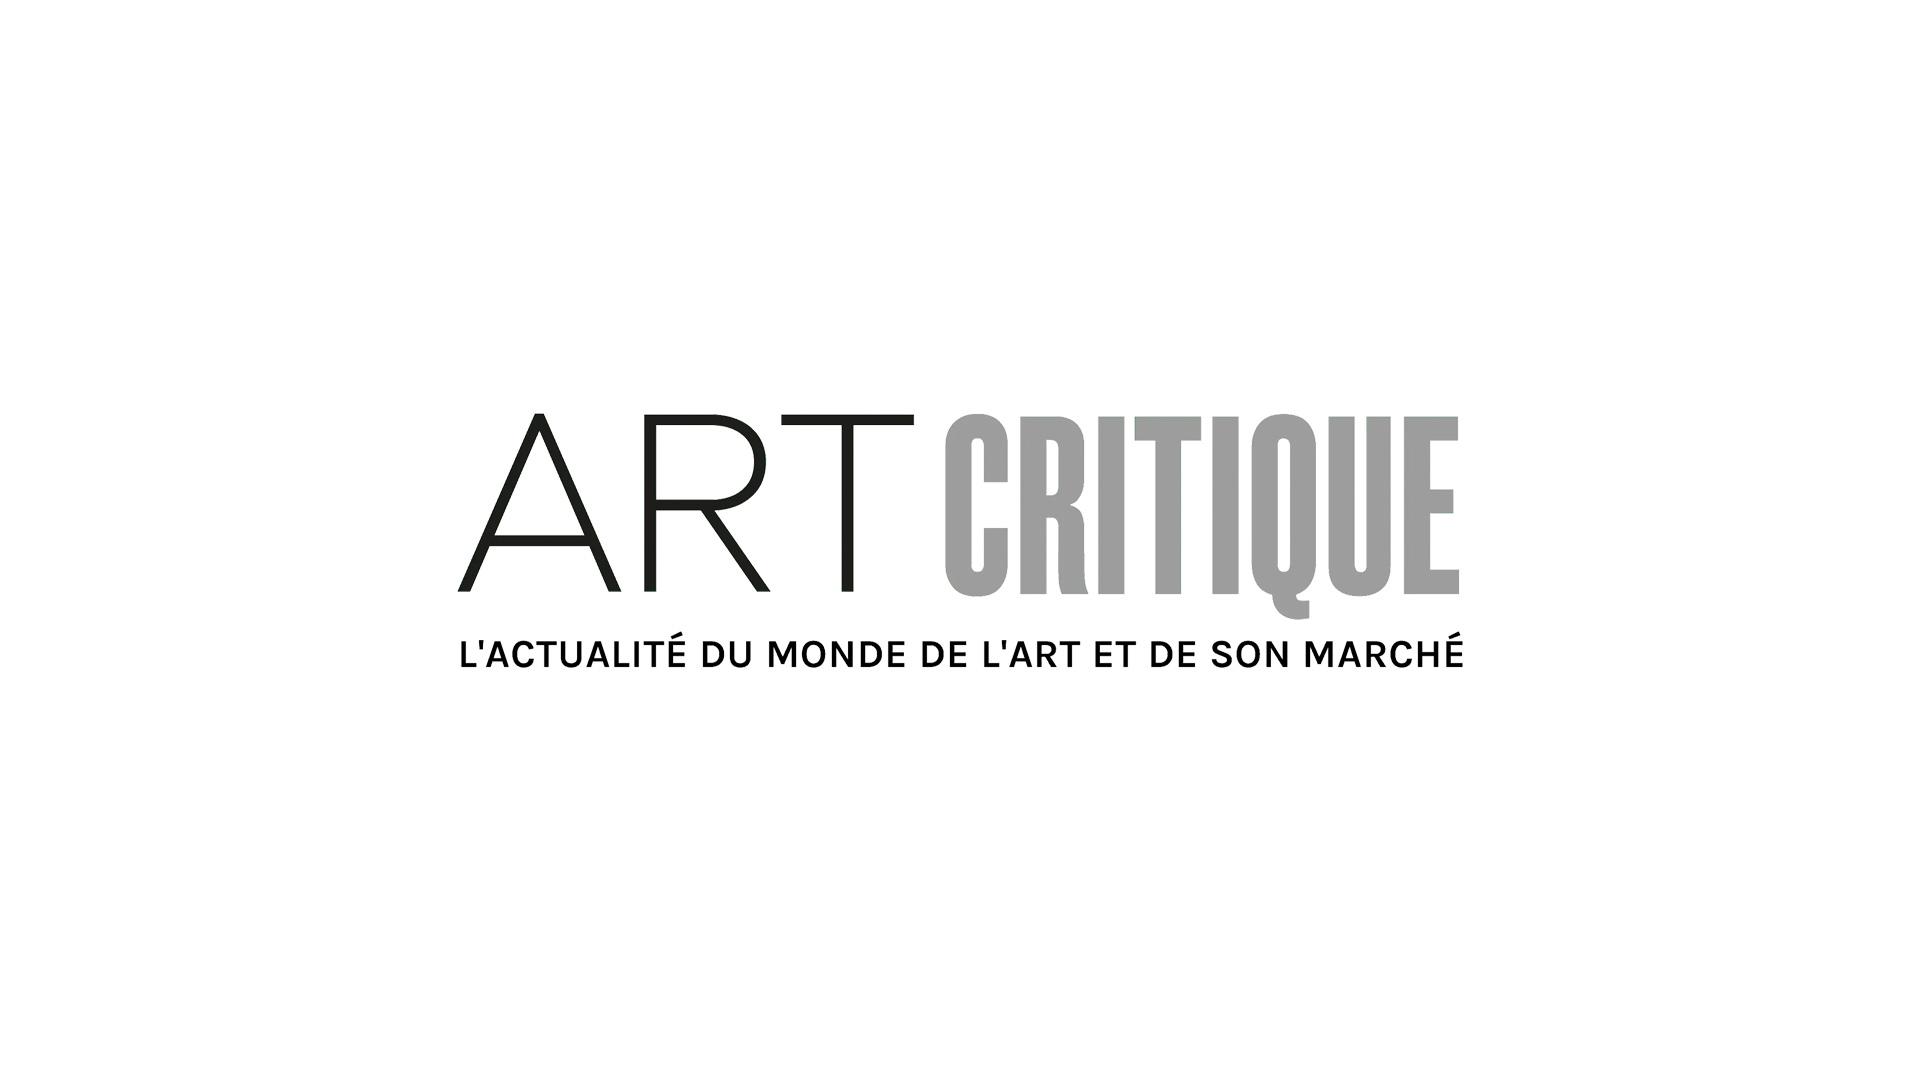 Banksy va-t-il perdre ses marques et ses oeuvres?